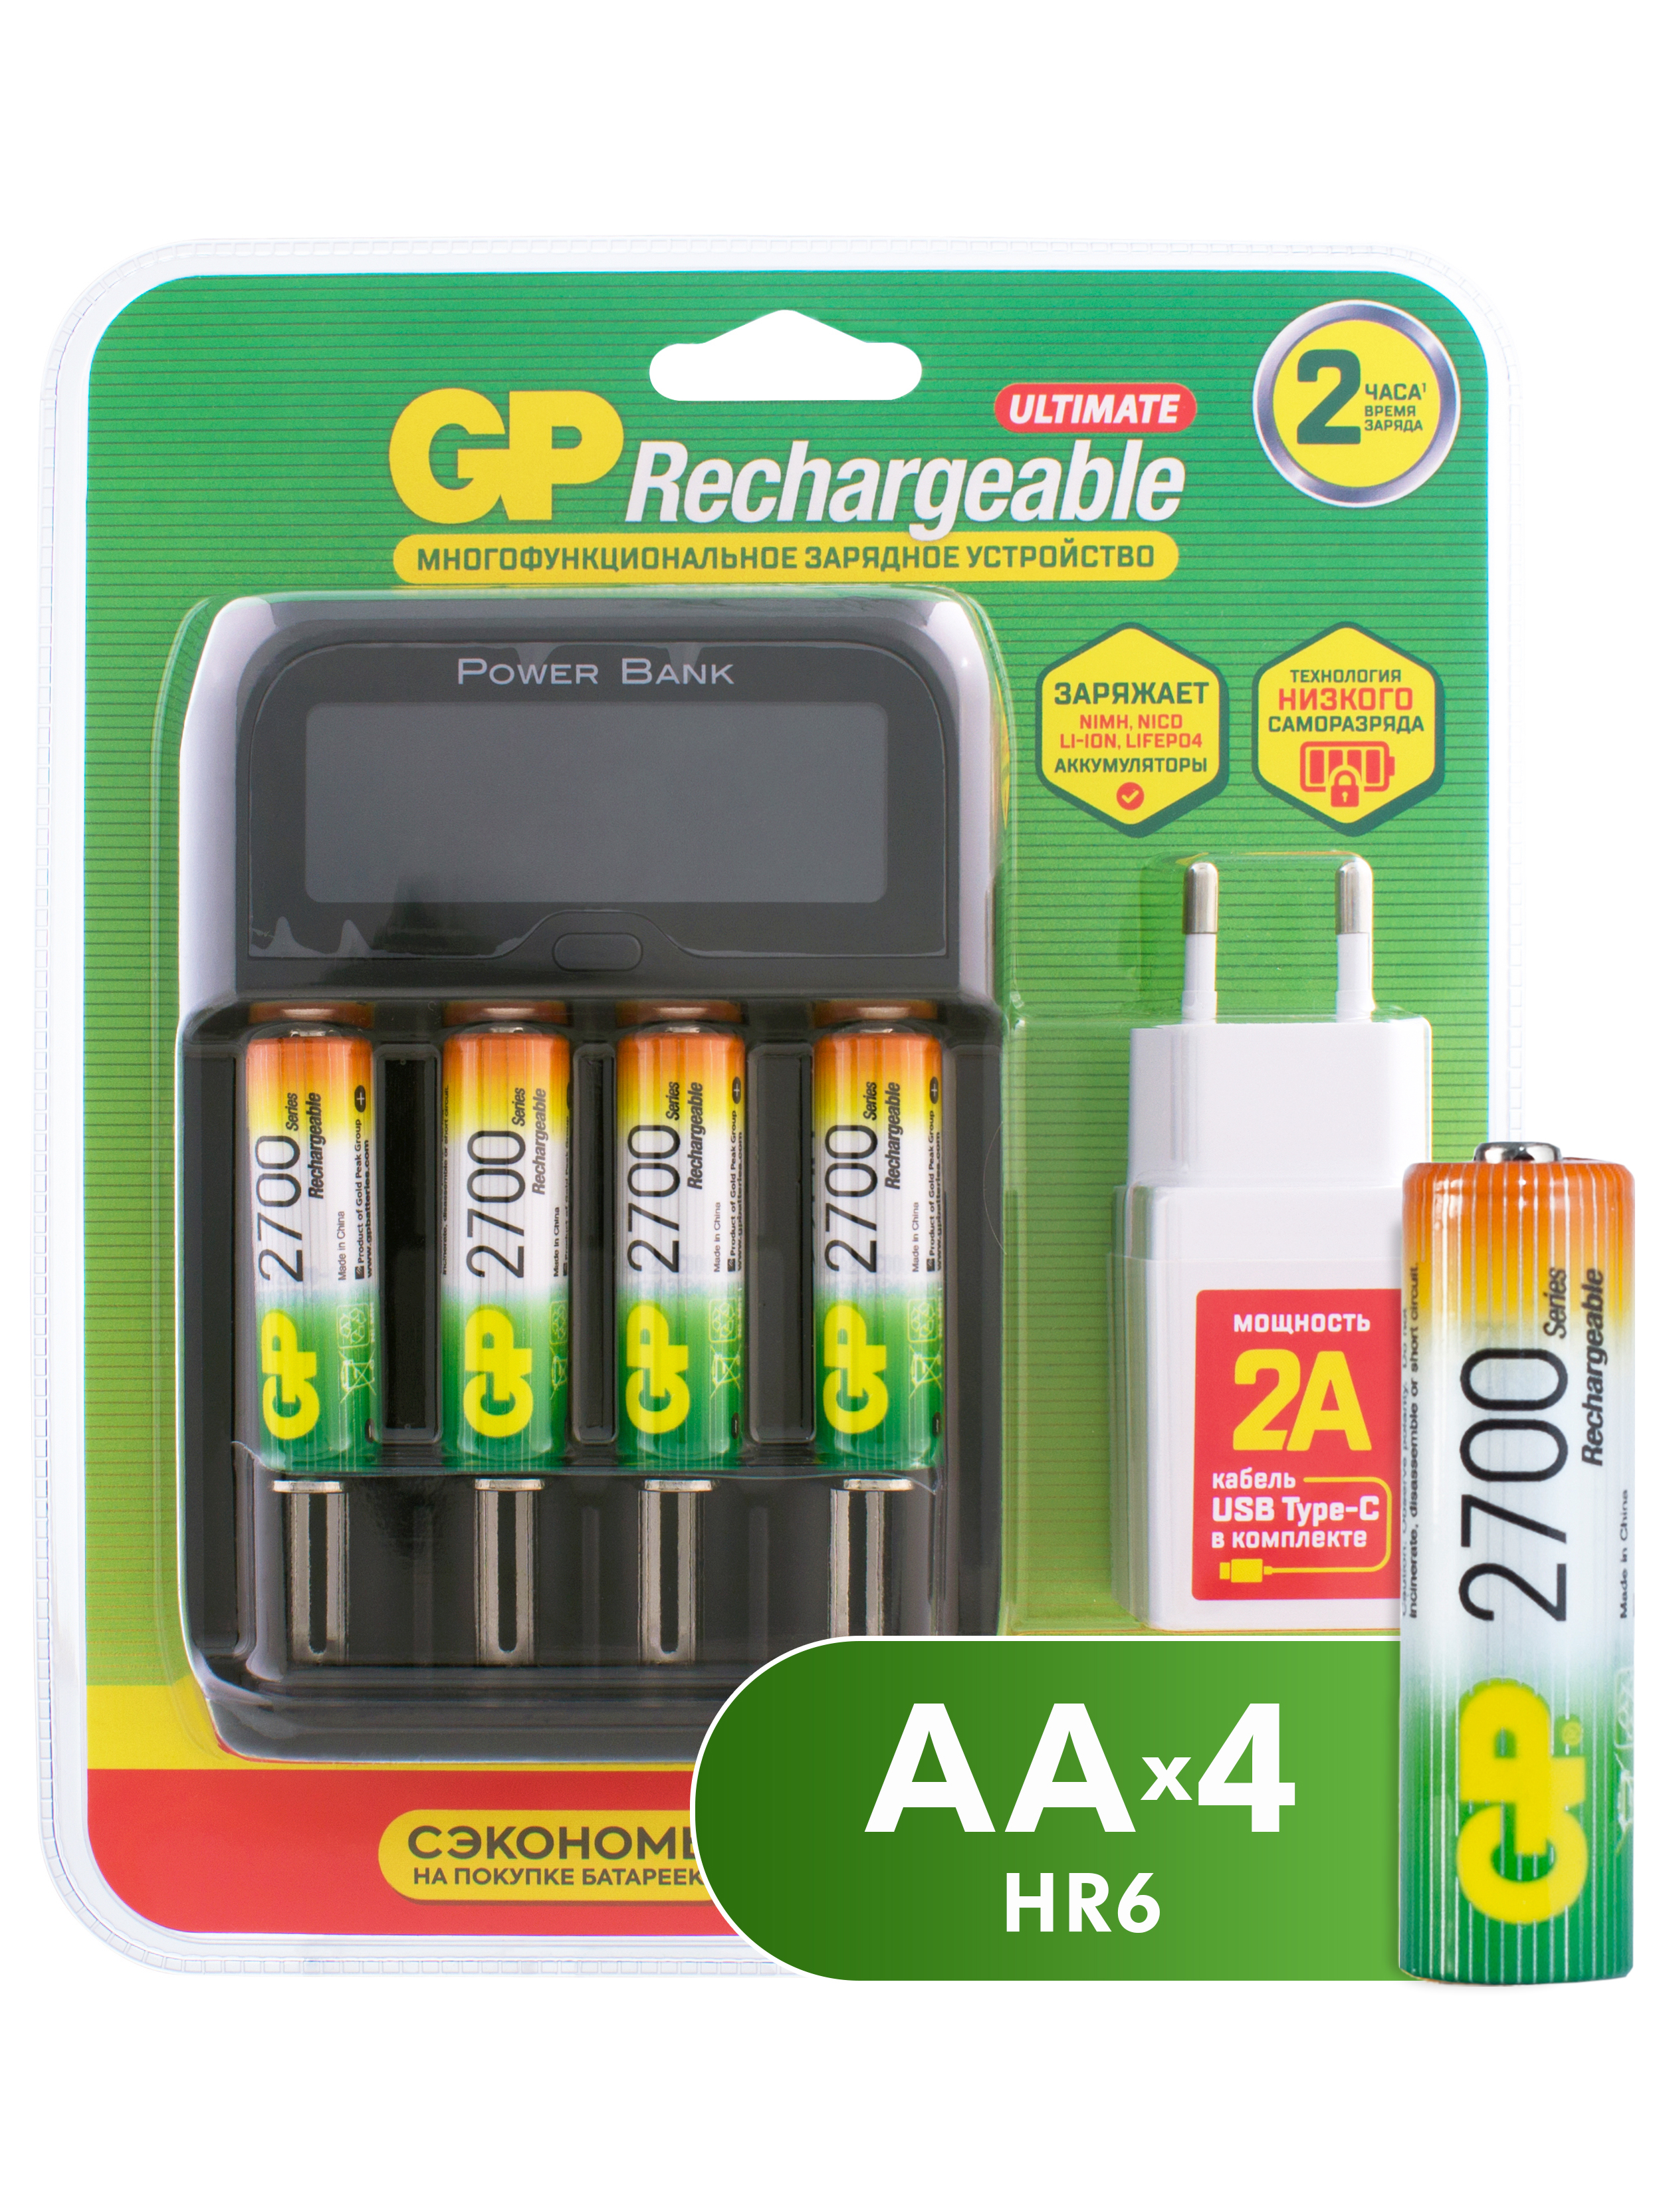 Зарядное устройство GP + аккумуляторы АА (HR6)